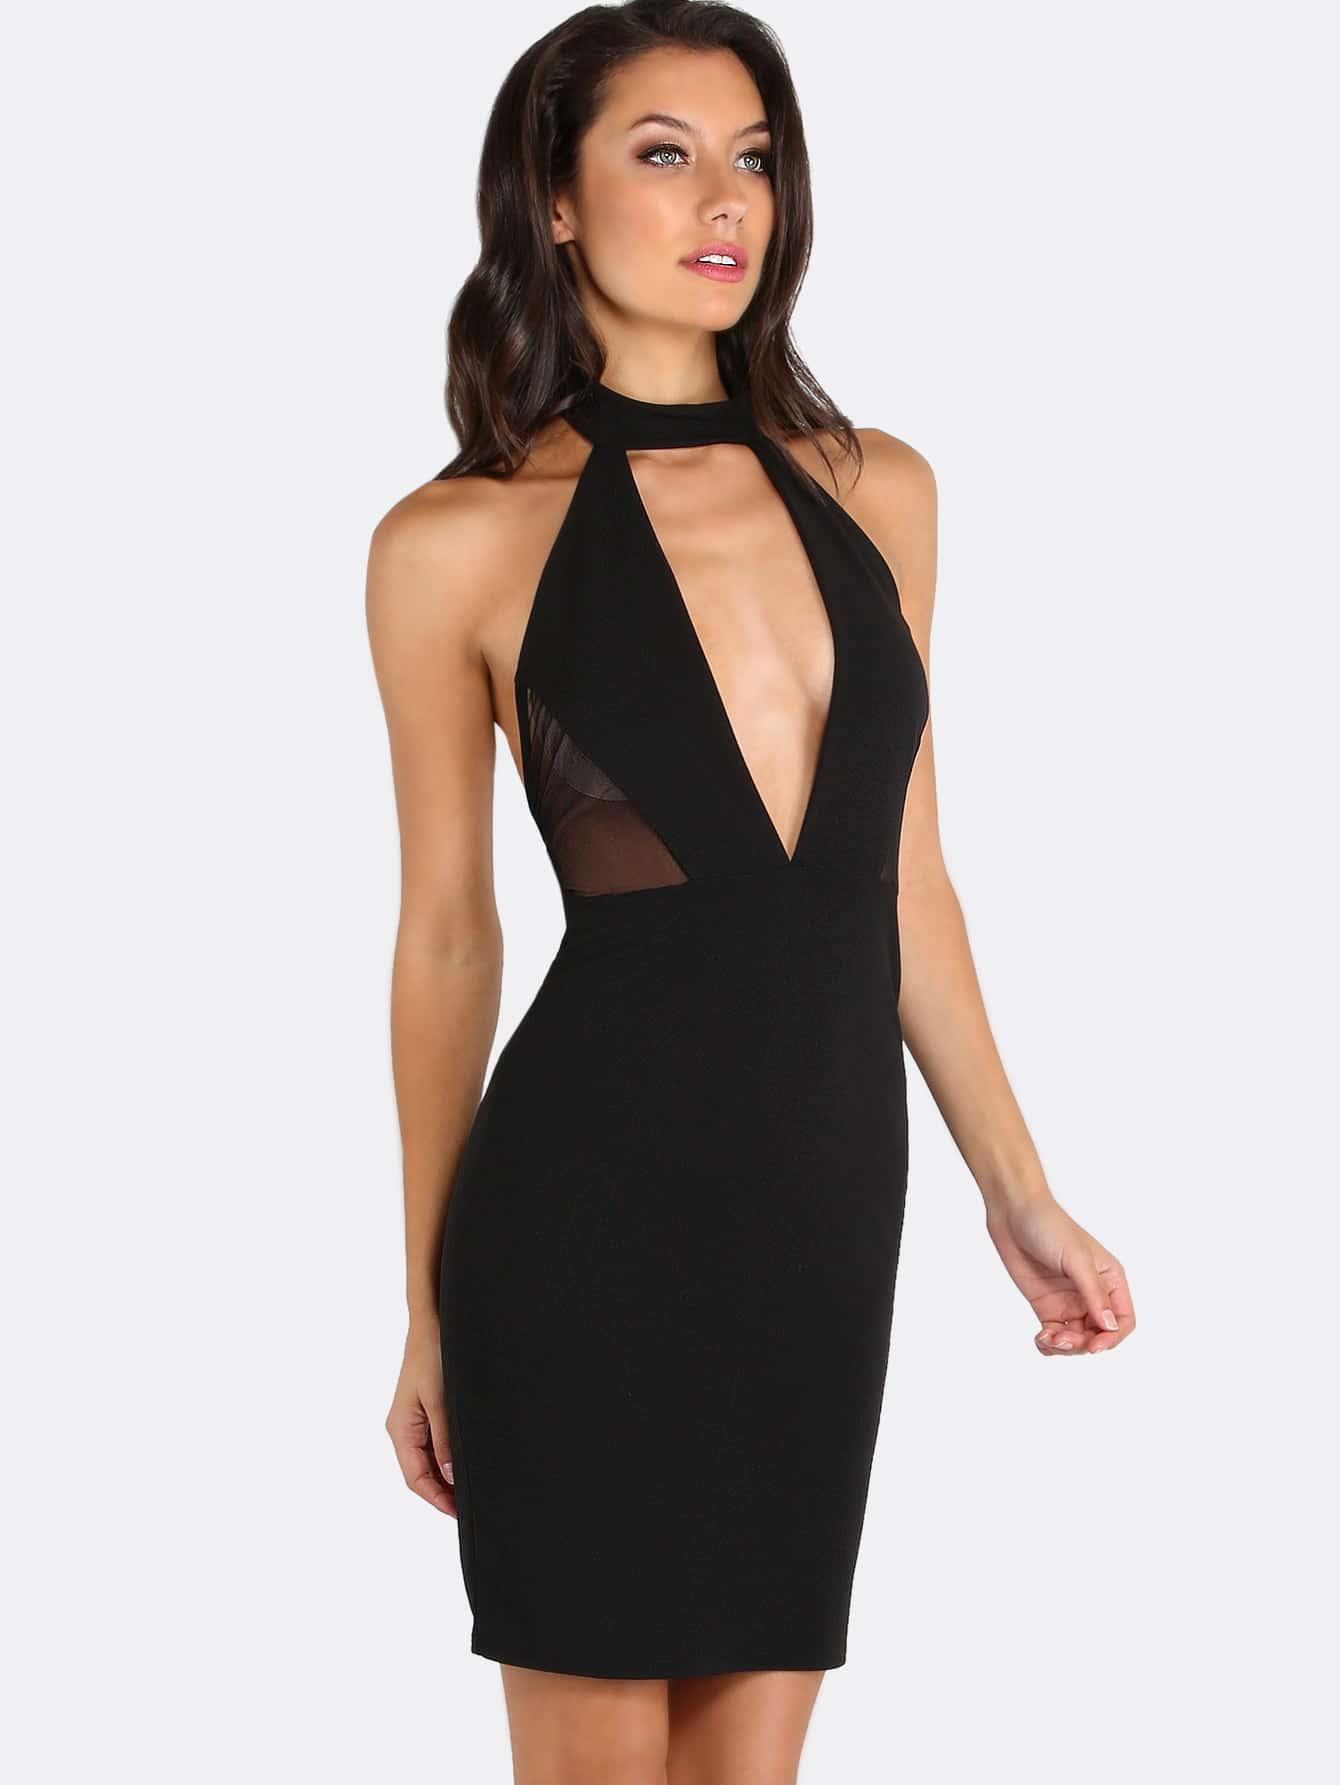 Choker Neck Bodycon Halter Dress Black Shein Sheinside